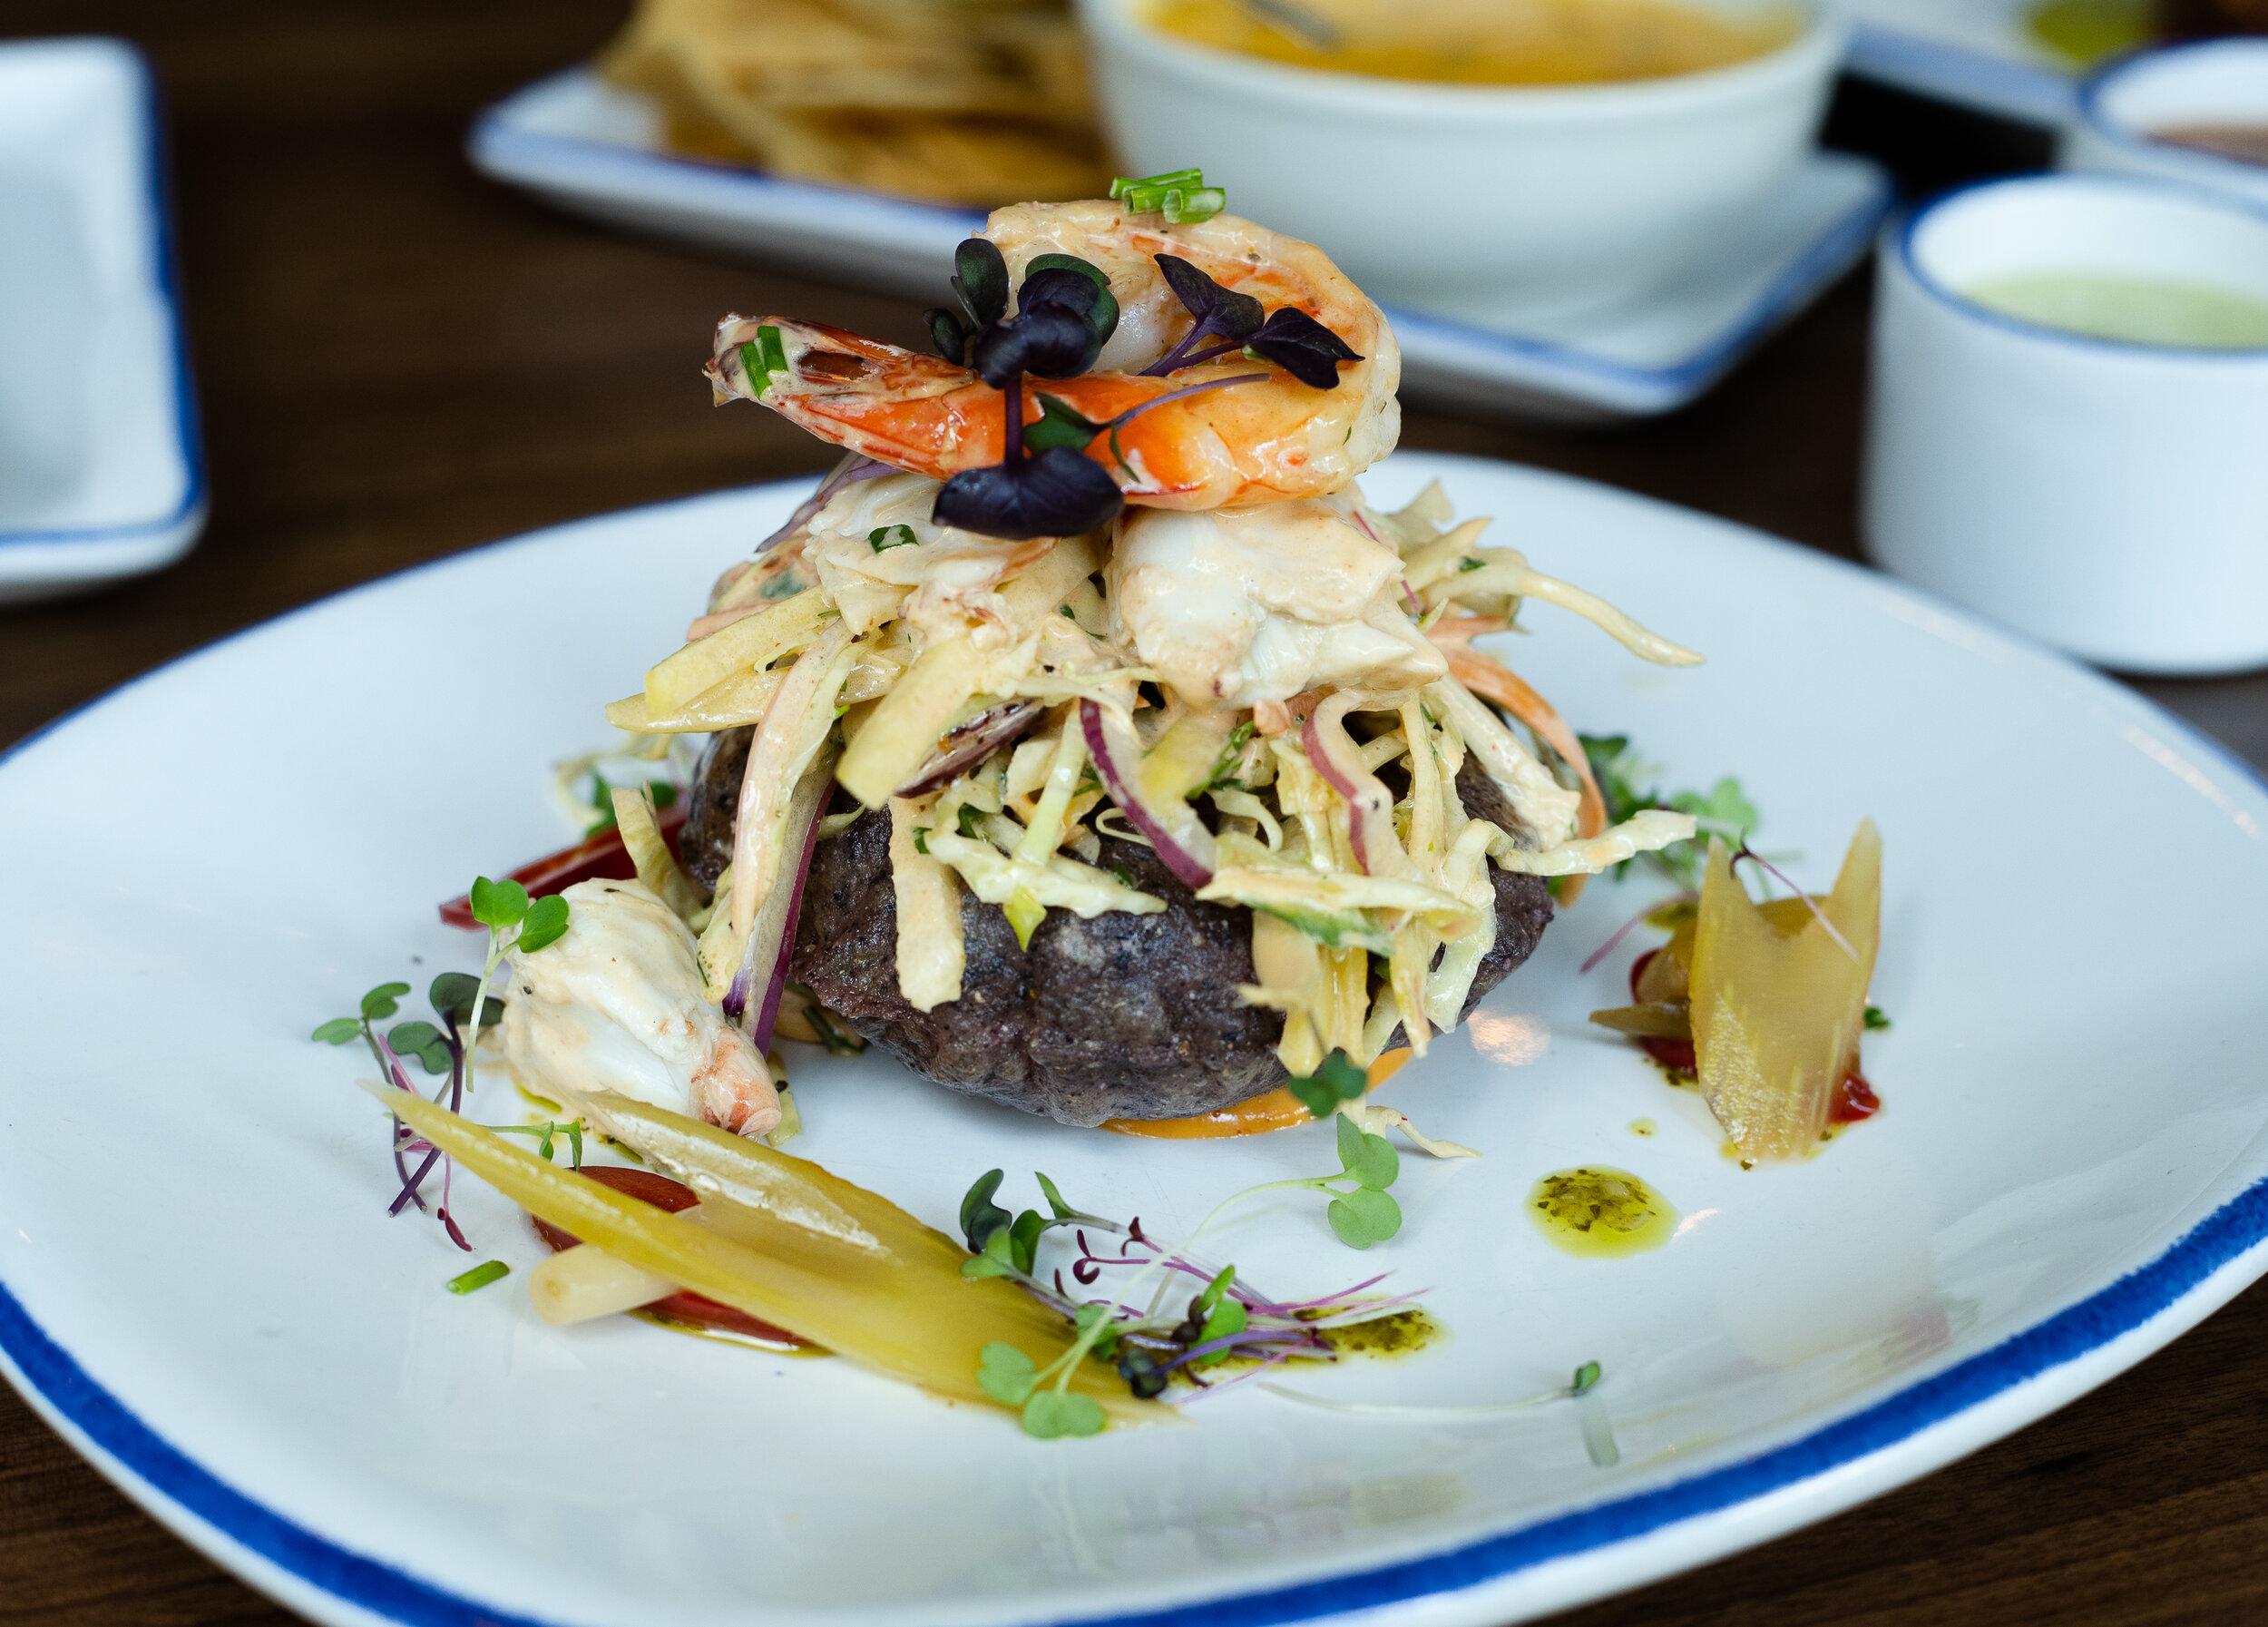 Spicy Crab and Shrimp Tostada